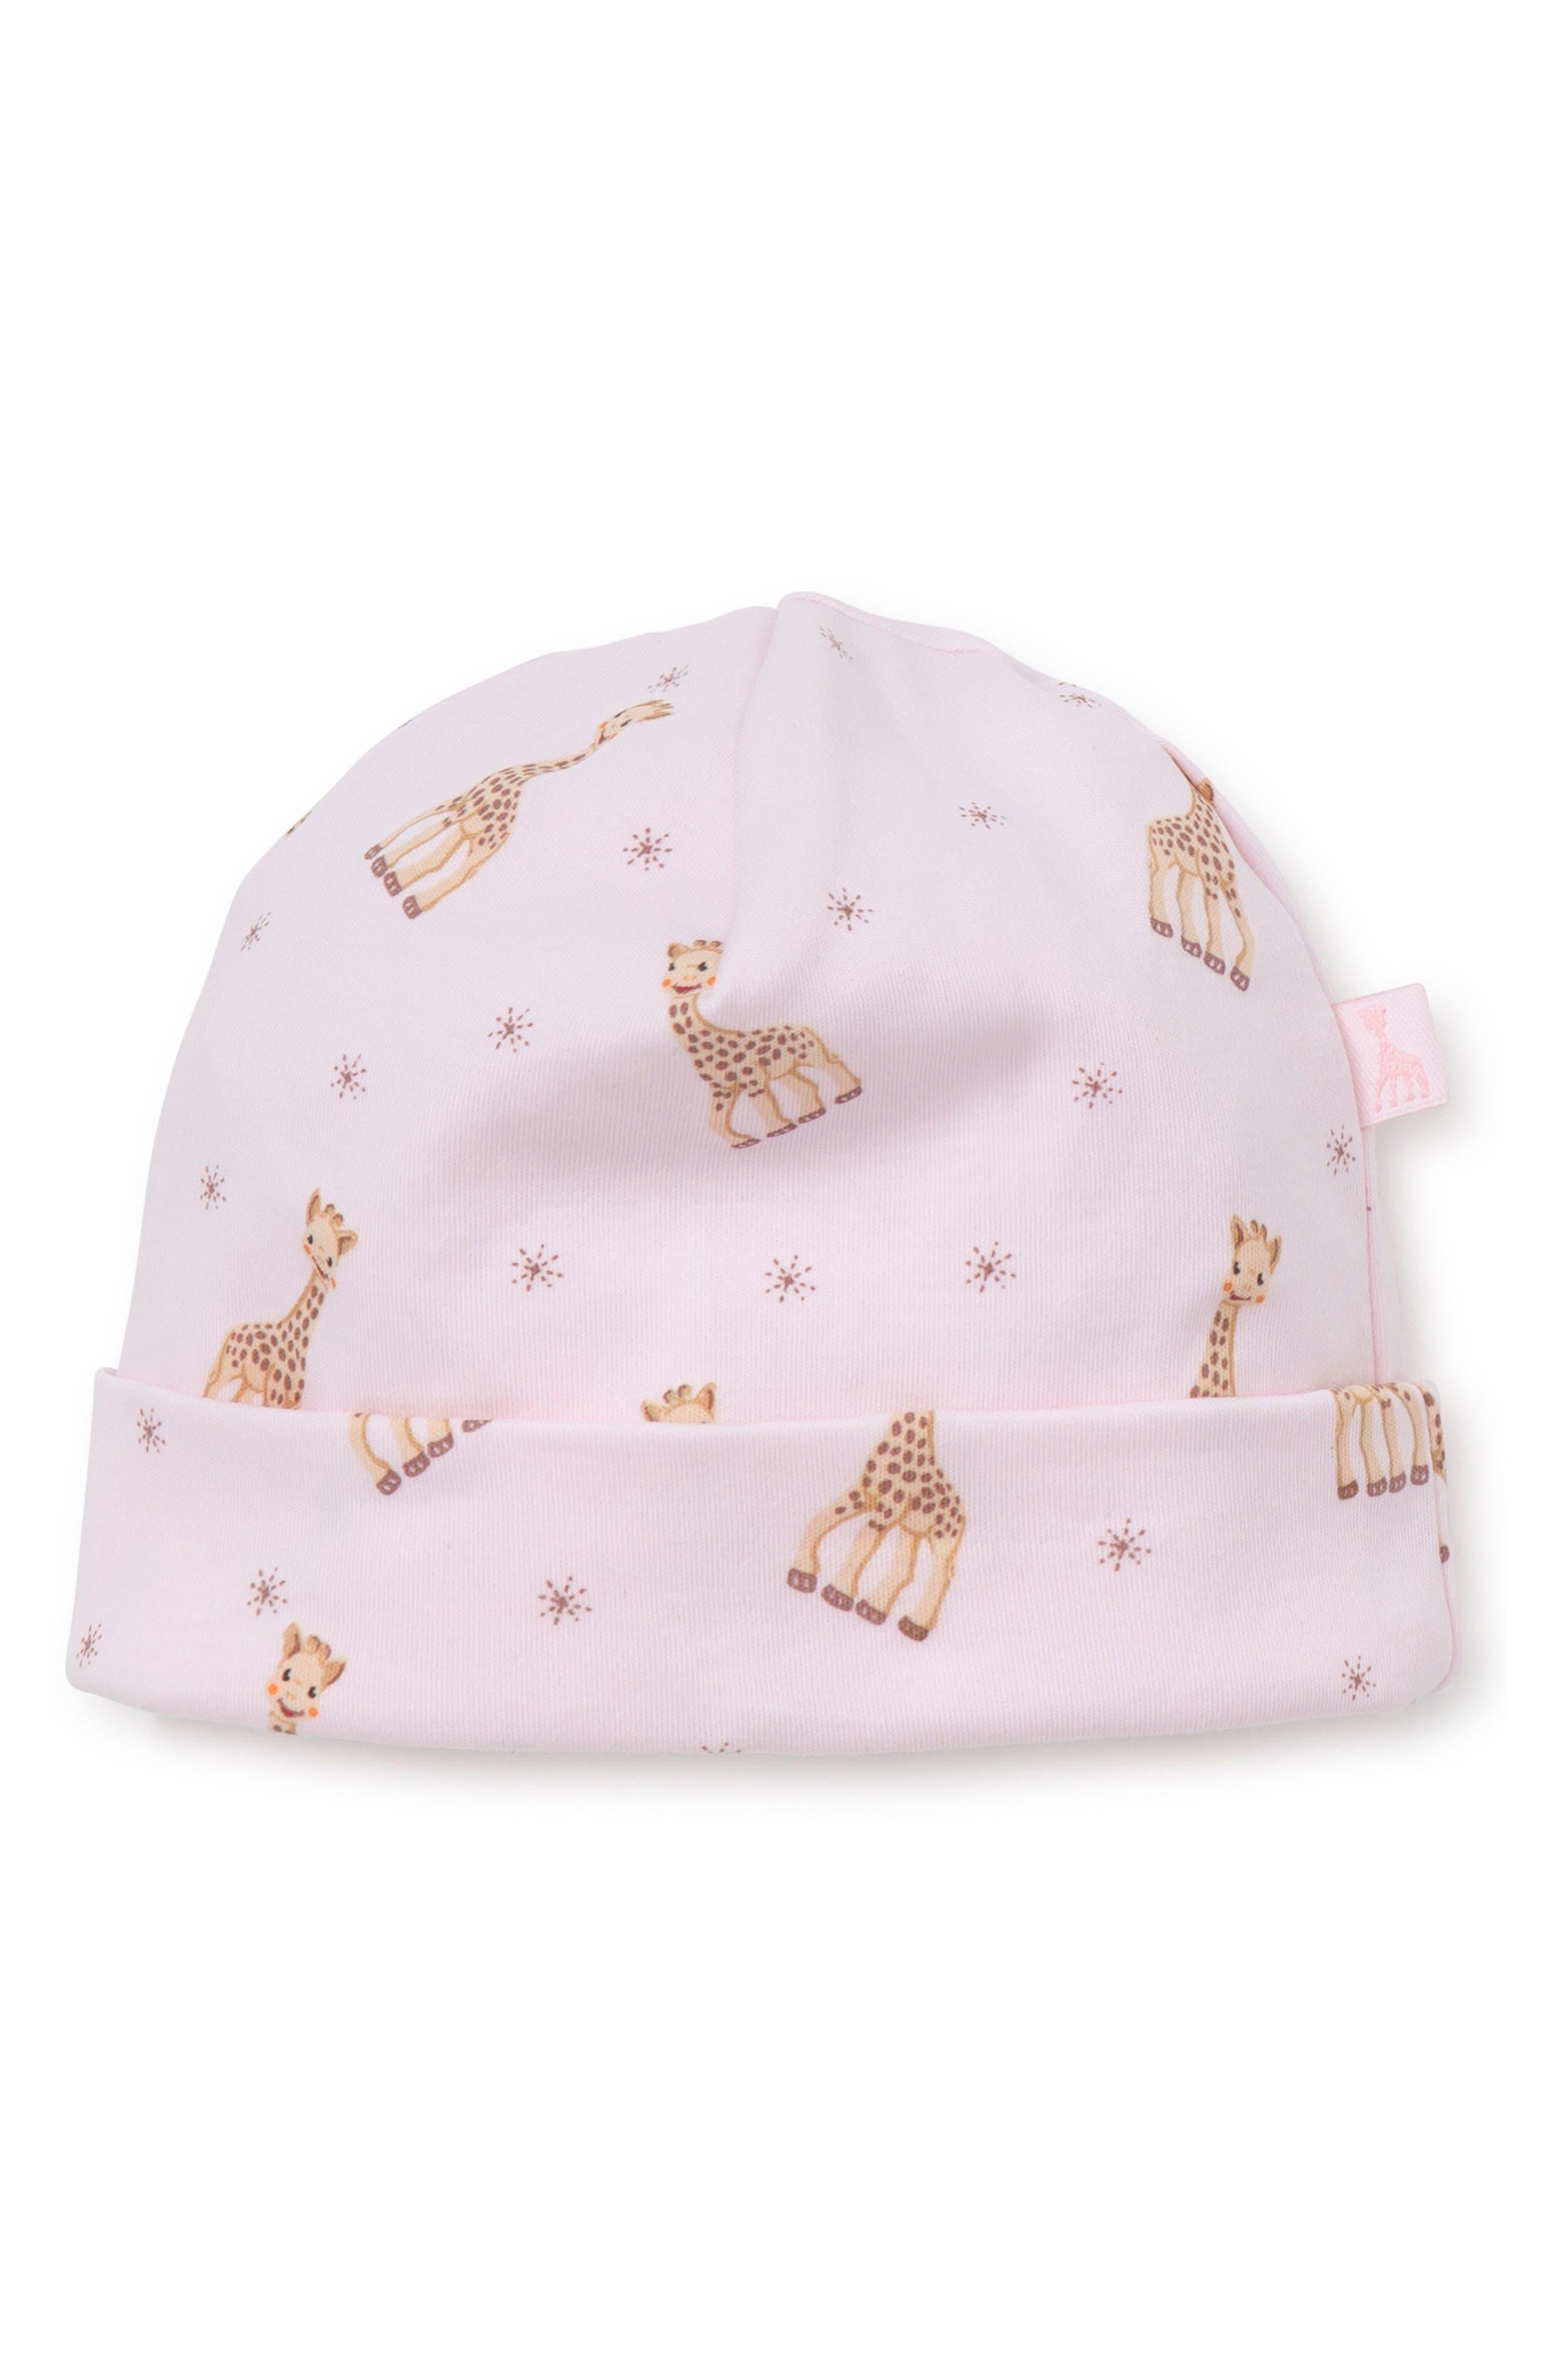 x Sophie la Girafe Beanie Hat,                         Main,                         color, PINK